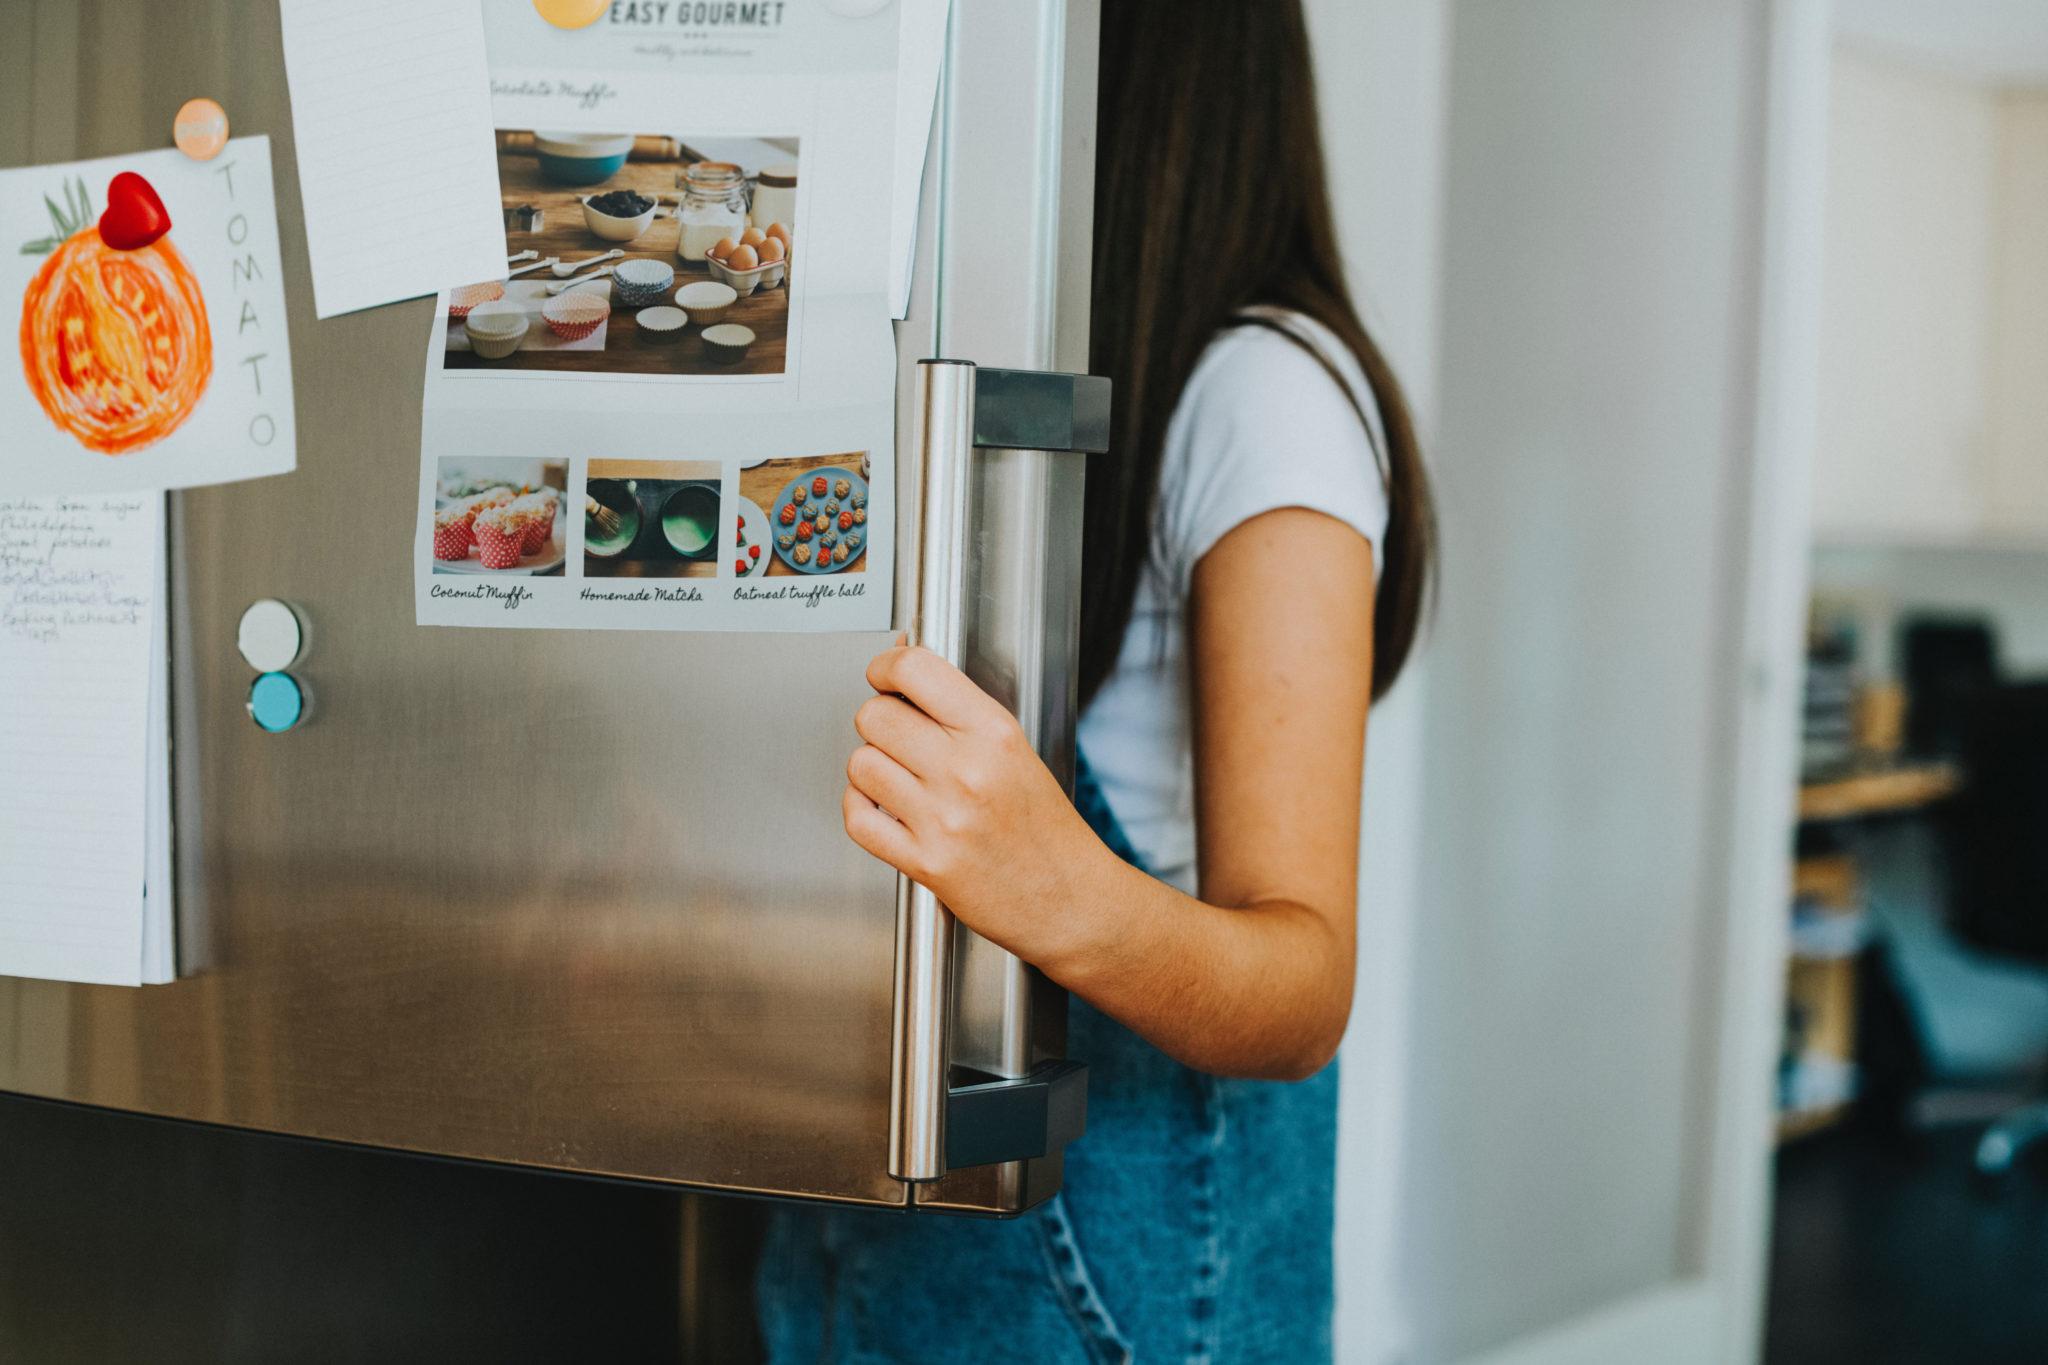 how to keep produce fresh in fridge